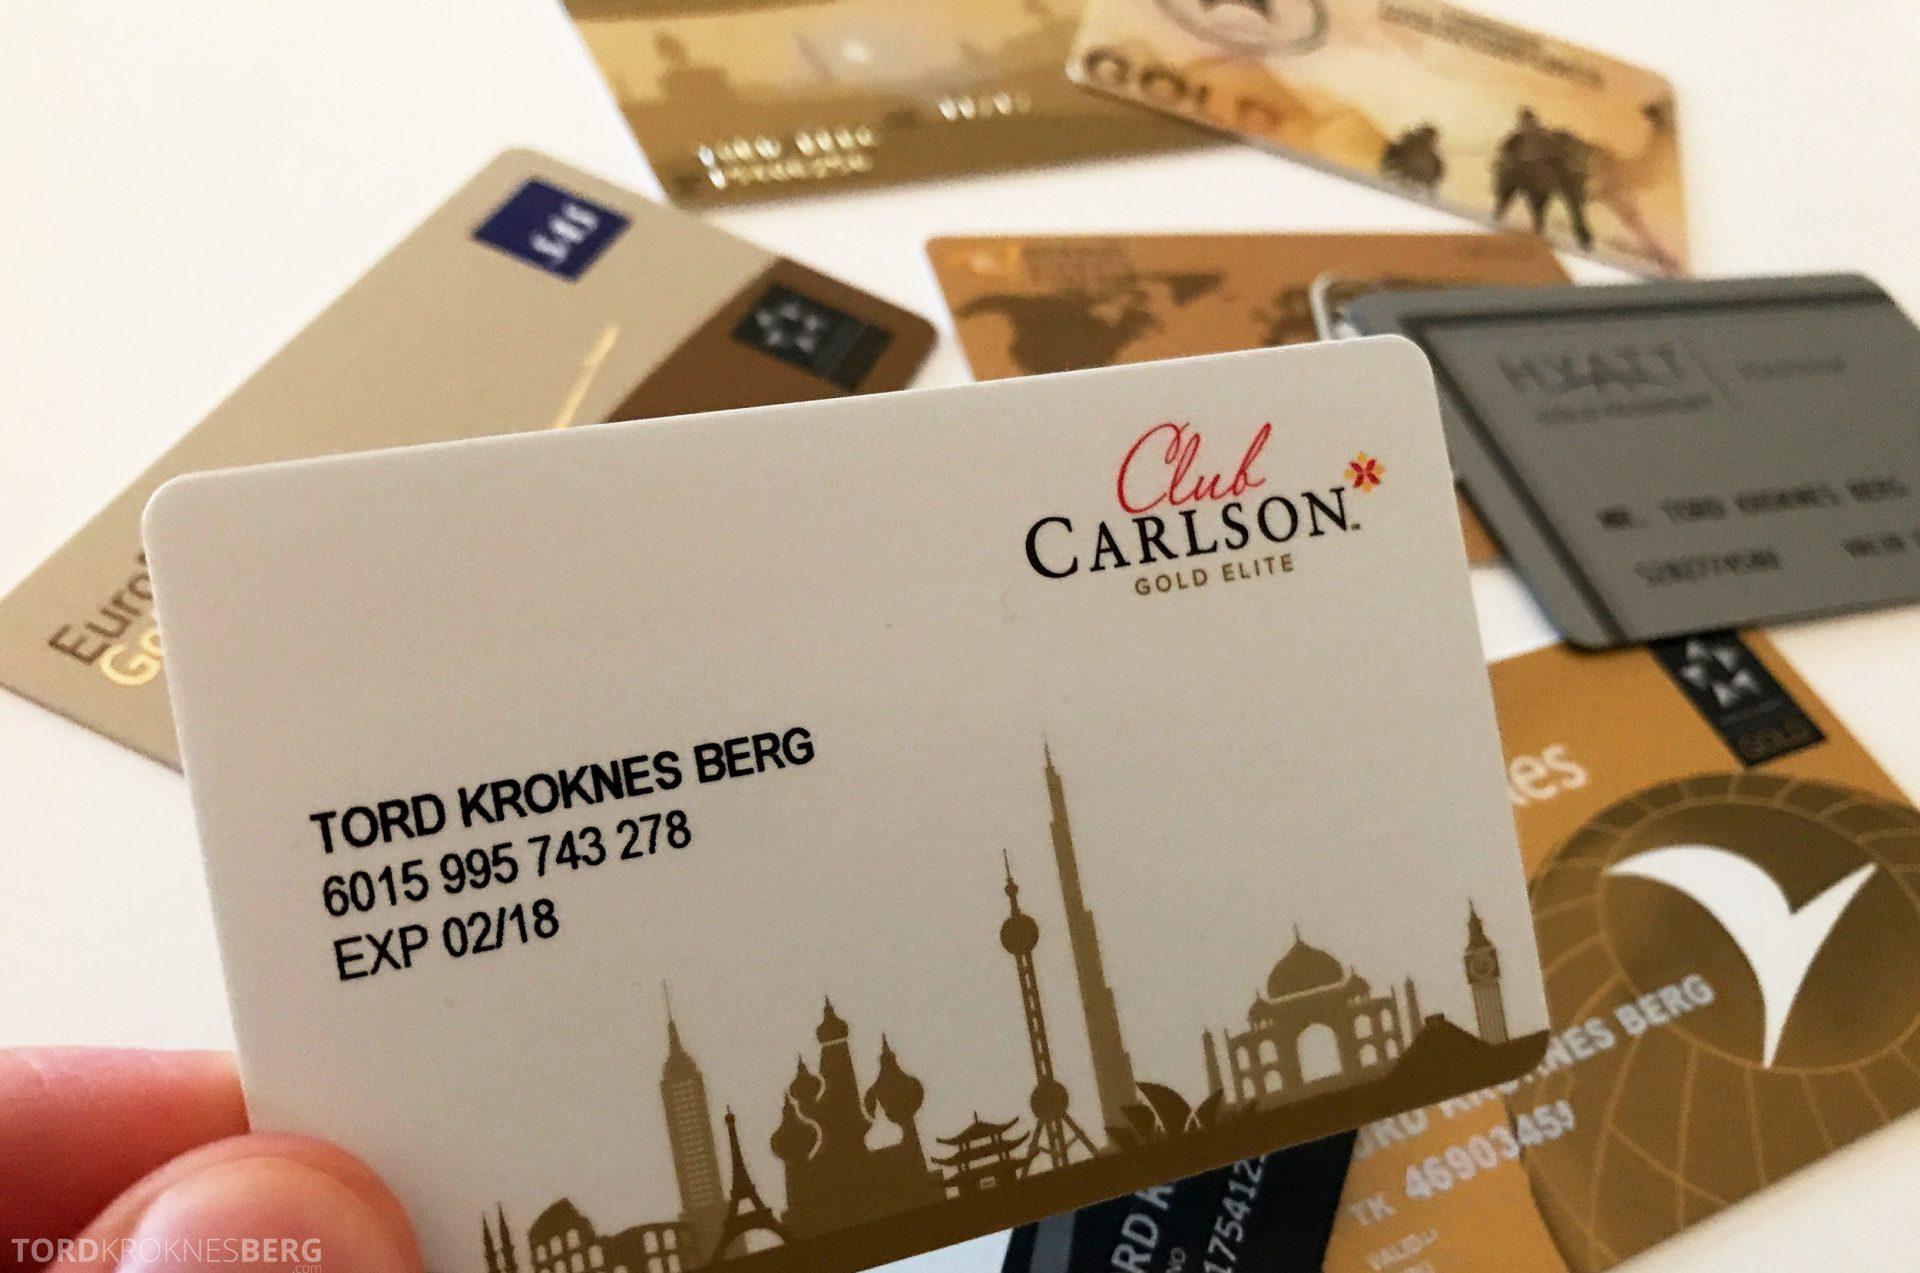 Club Carlson Gold